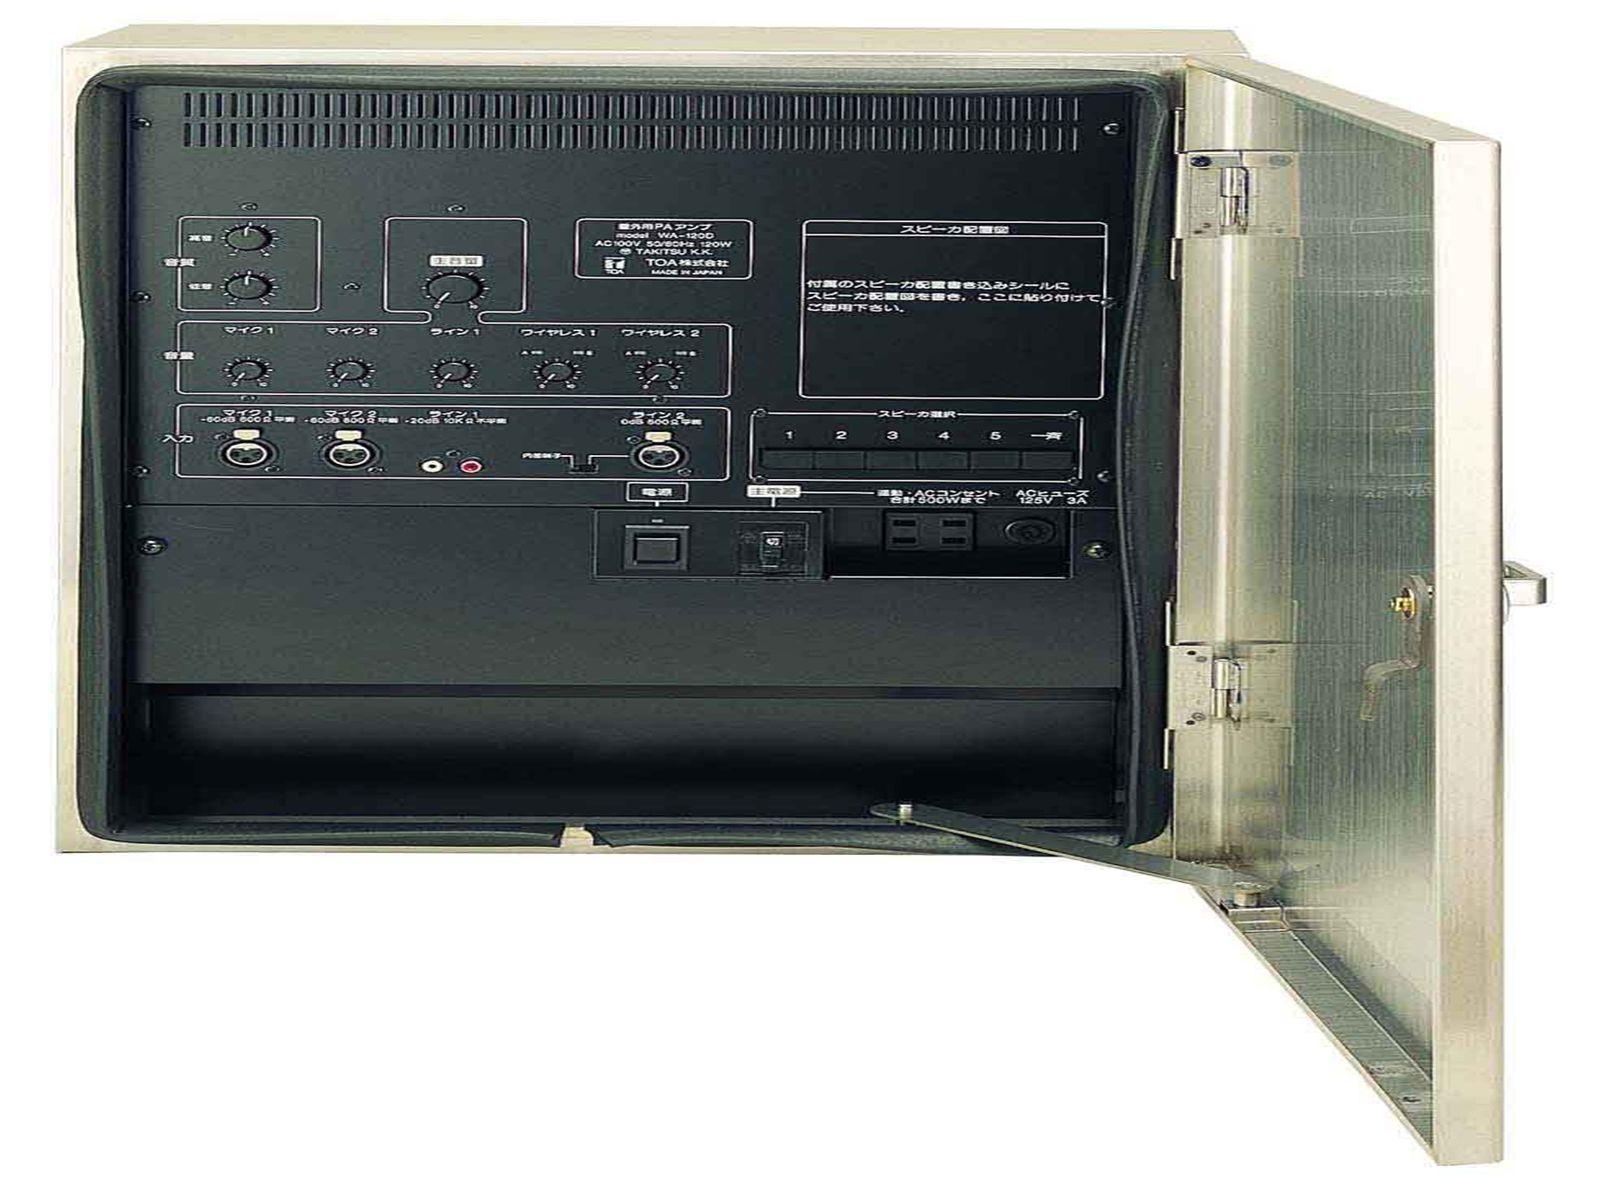 TOA(ティーオーエー・トーア) WA-120D 屋外用アンプ 120W 5局